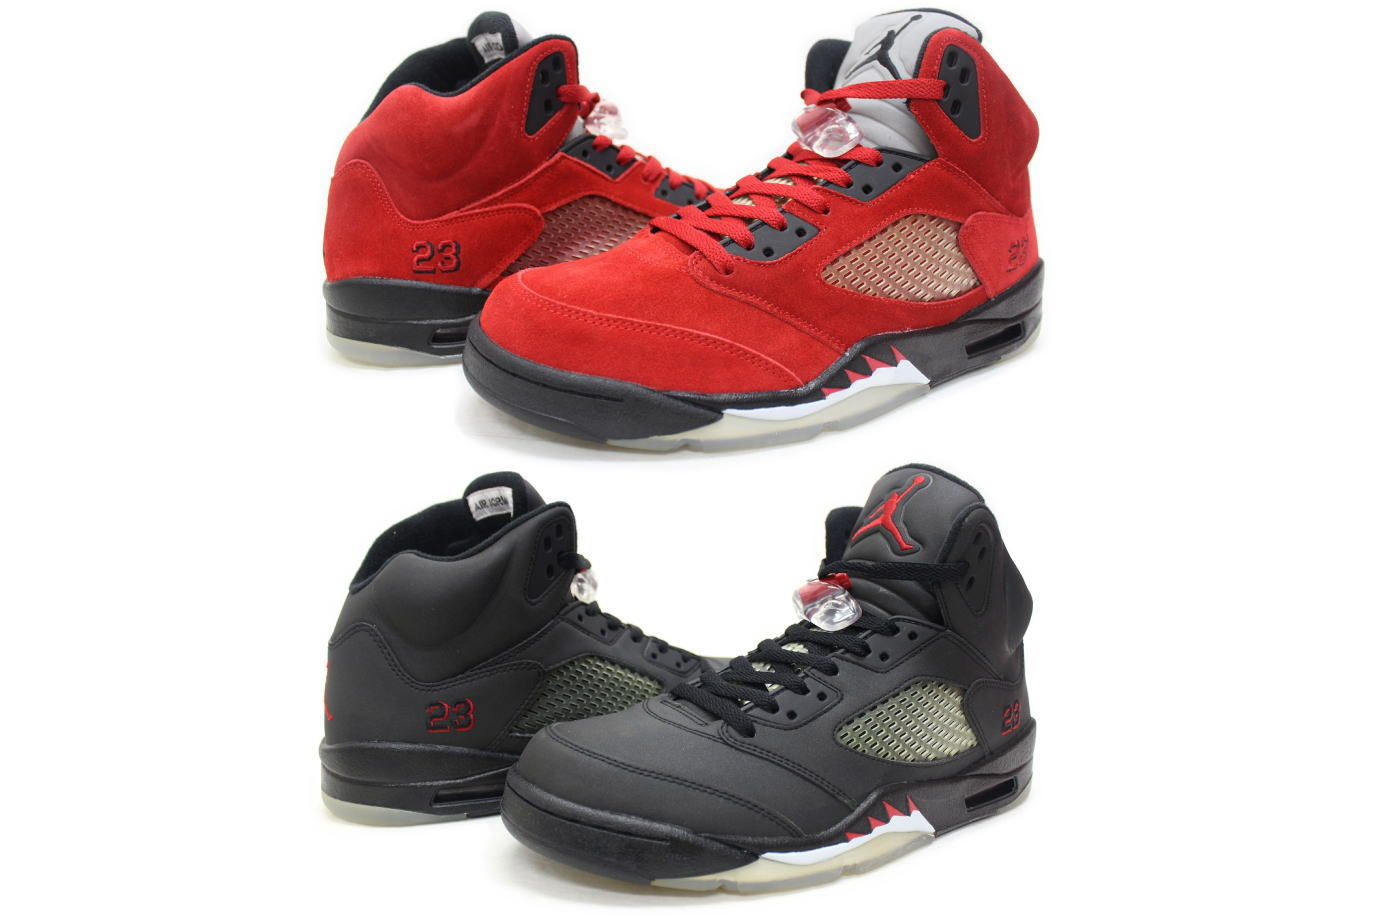 separation shoes 34692 ec5a0 NIKE AIR JORDAN 5 RETRO DMP bipedal set 360968-991 Nike Jordan retro 5  RAGING ...